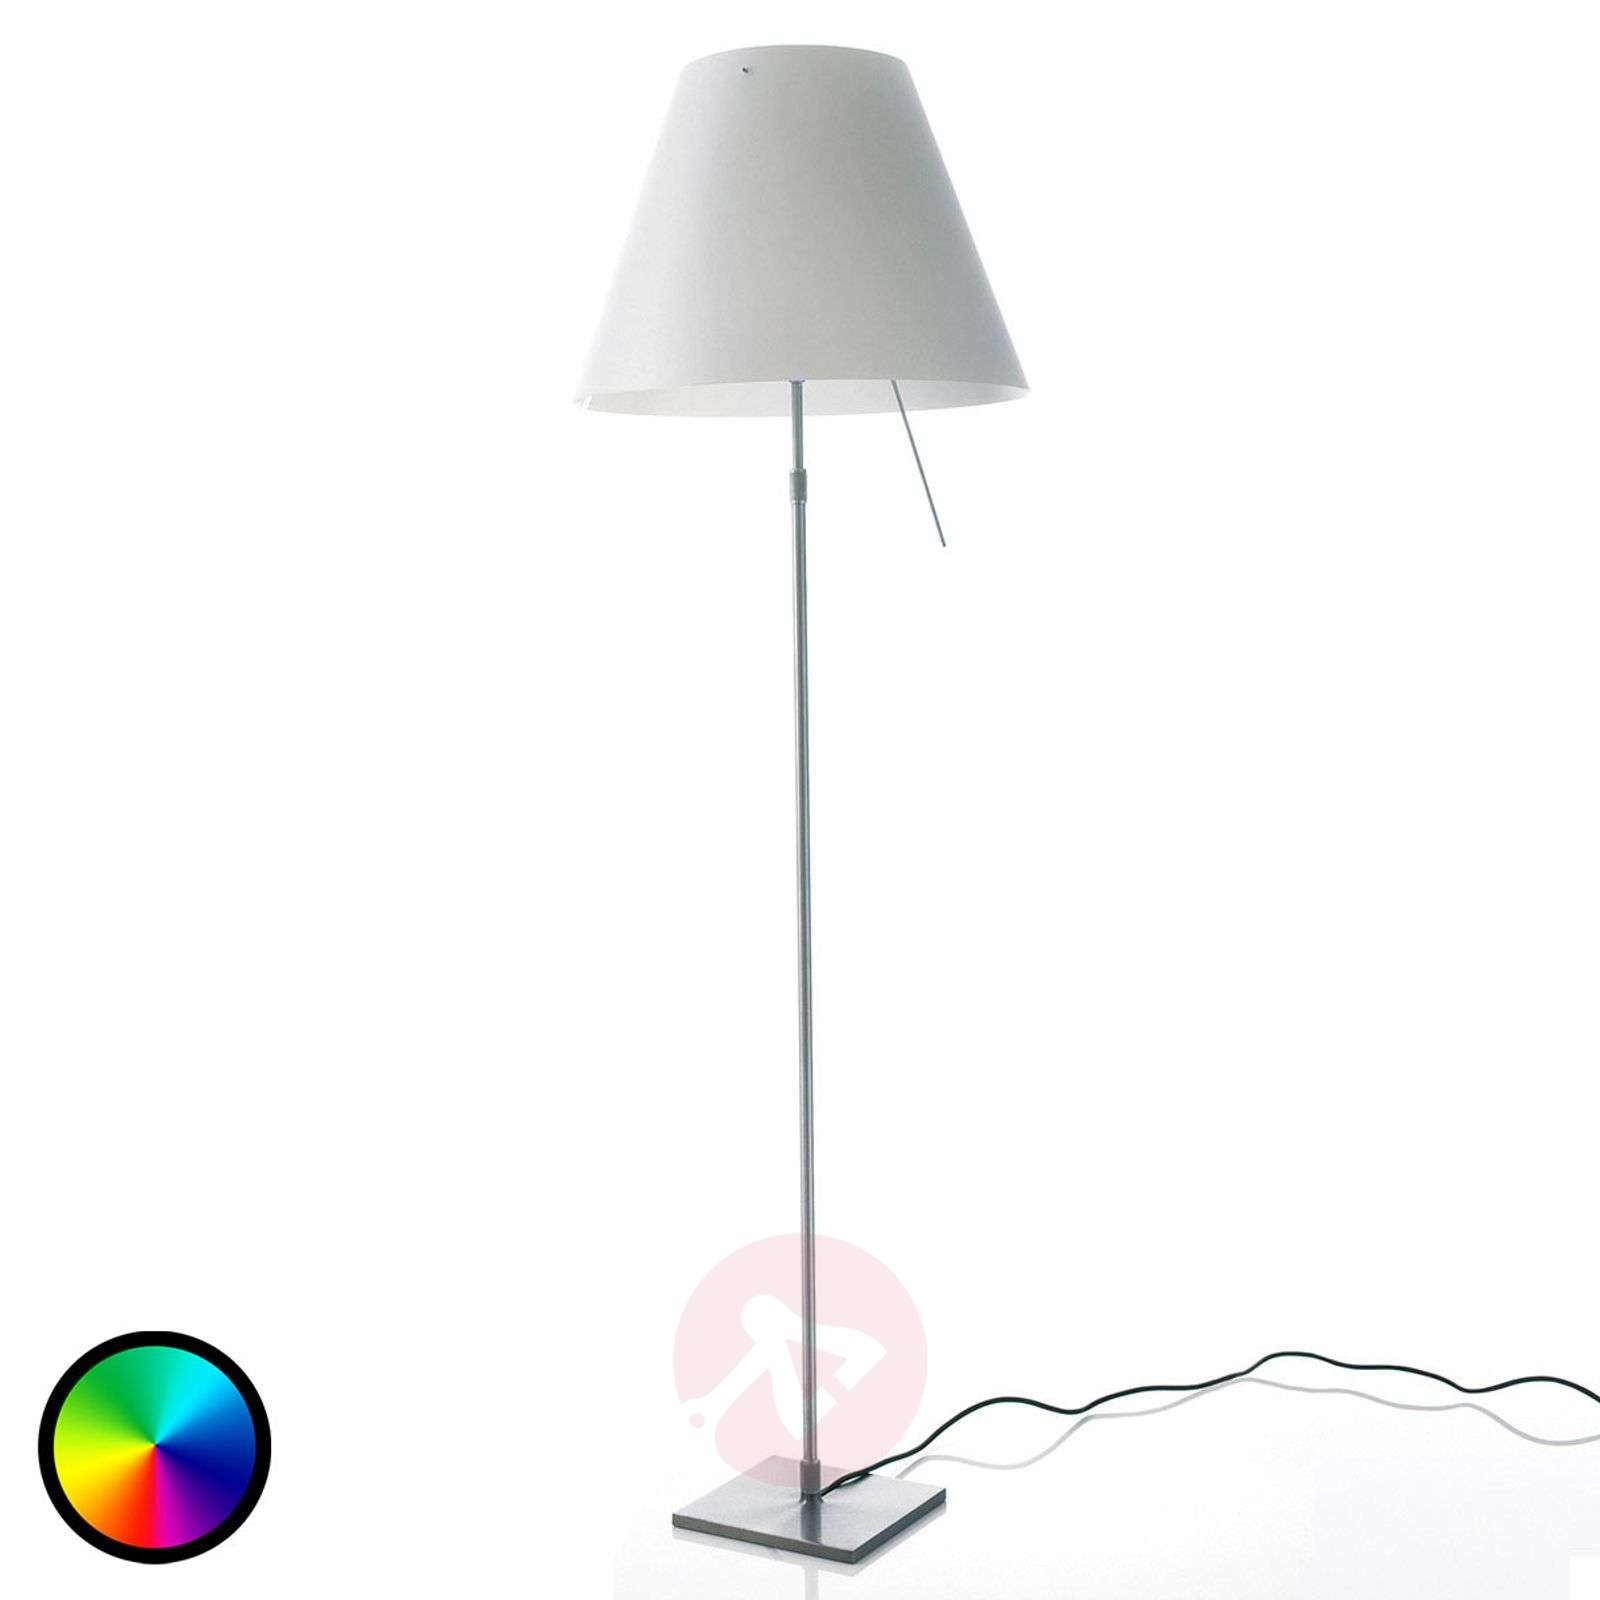 Luceplan Costanza lattiaval., Philips Hue-lamppu-6030167-01